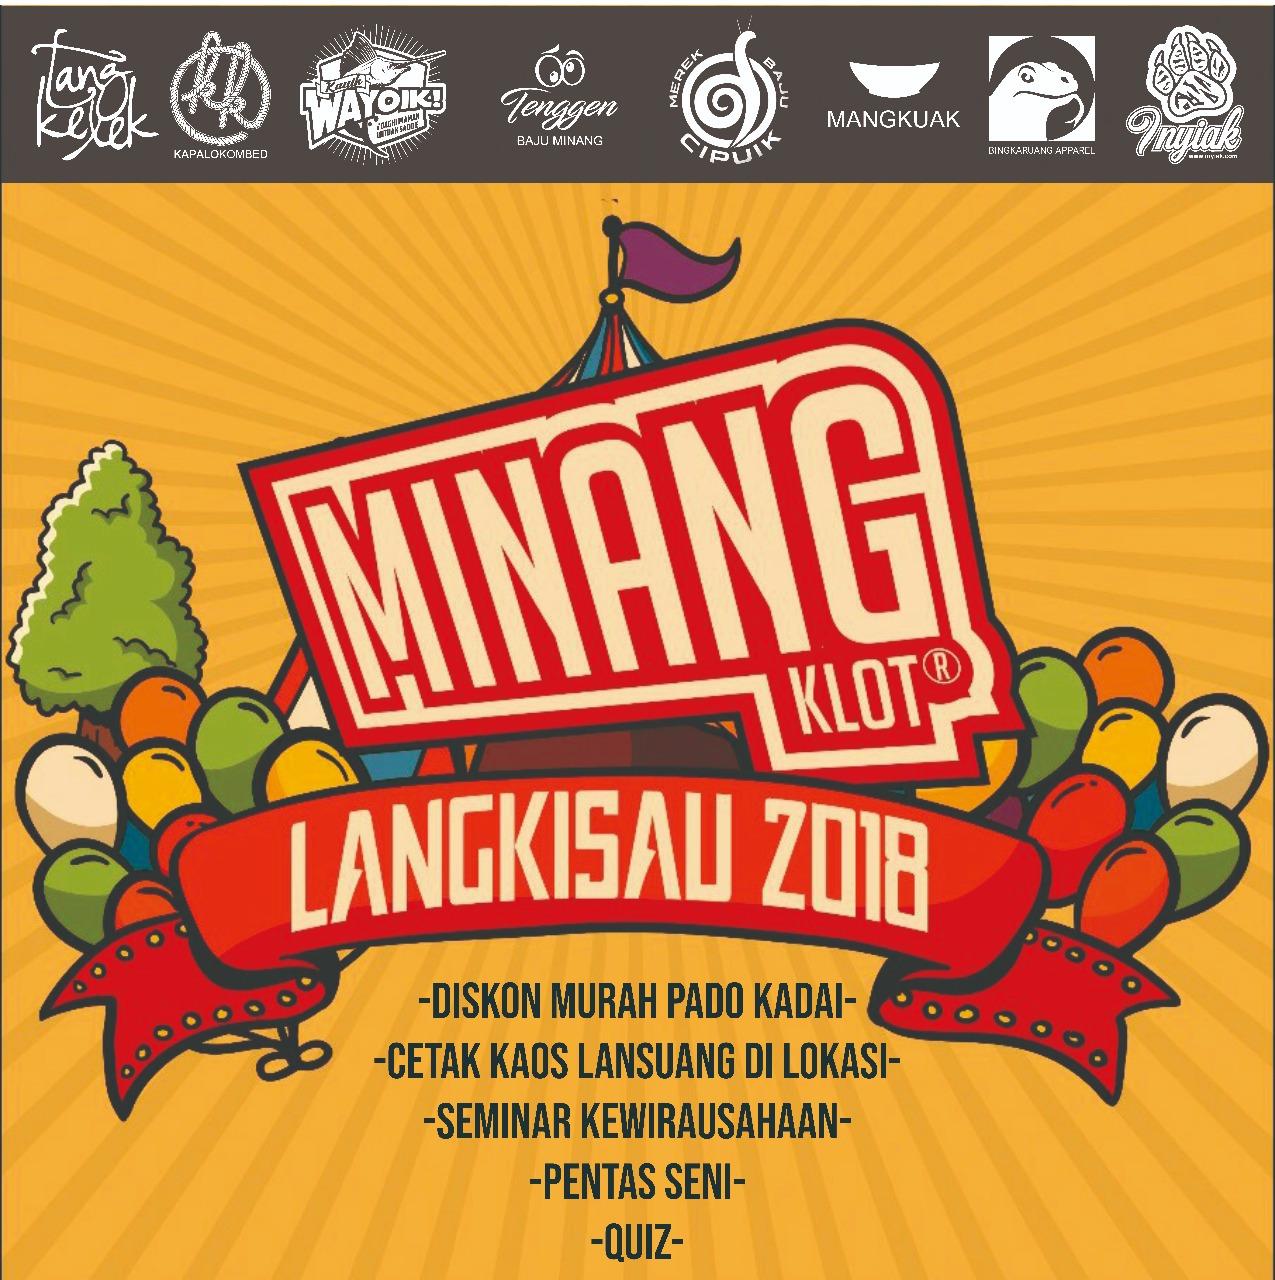 Asosiasi Pengusaha Kaos Minang Bakal Hadir Di Pessel Dalam Menyemarakan Festival Langkisau Tahun Ini